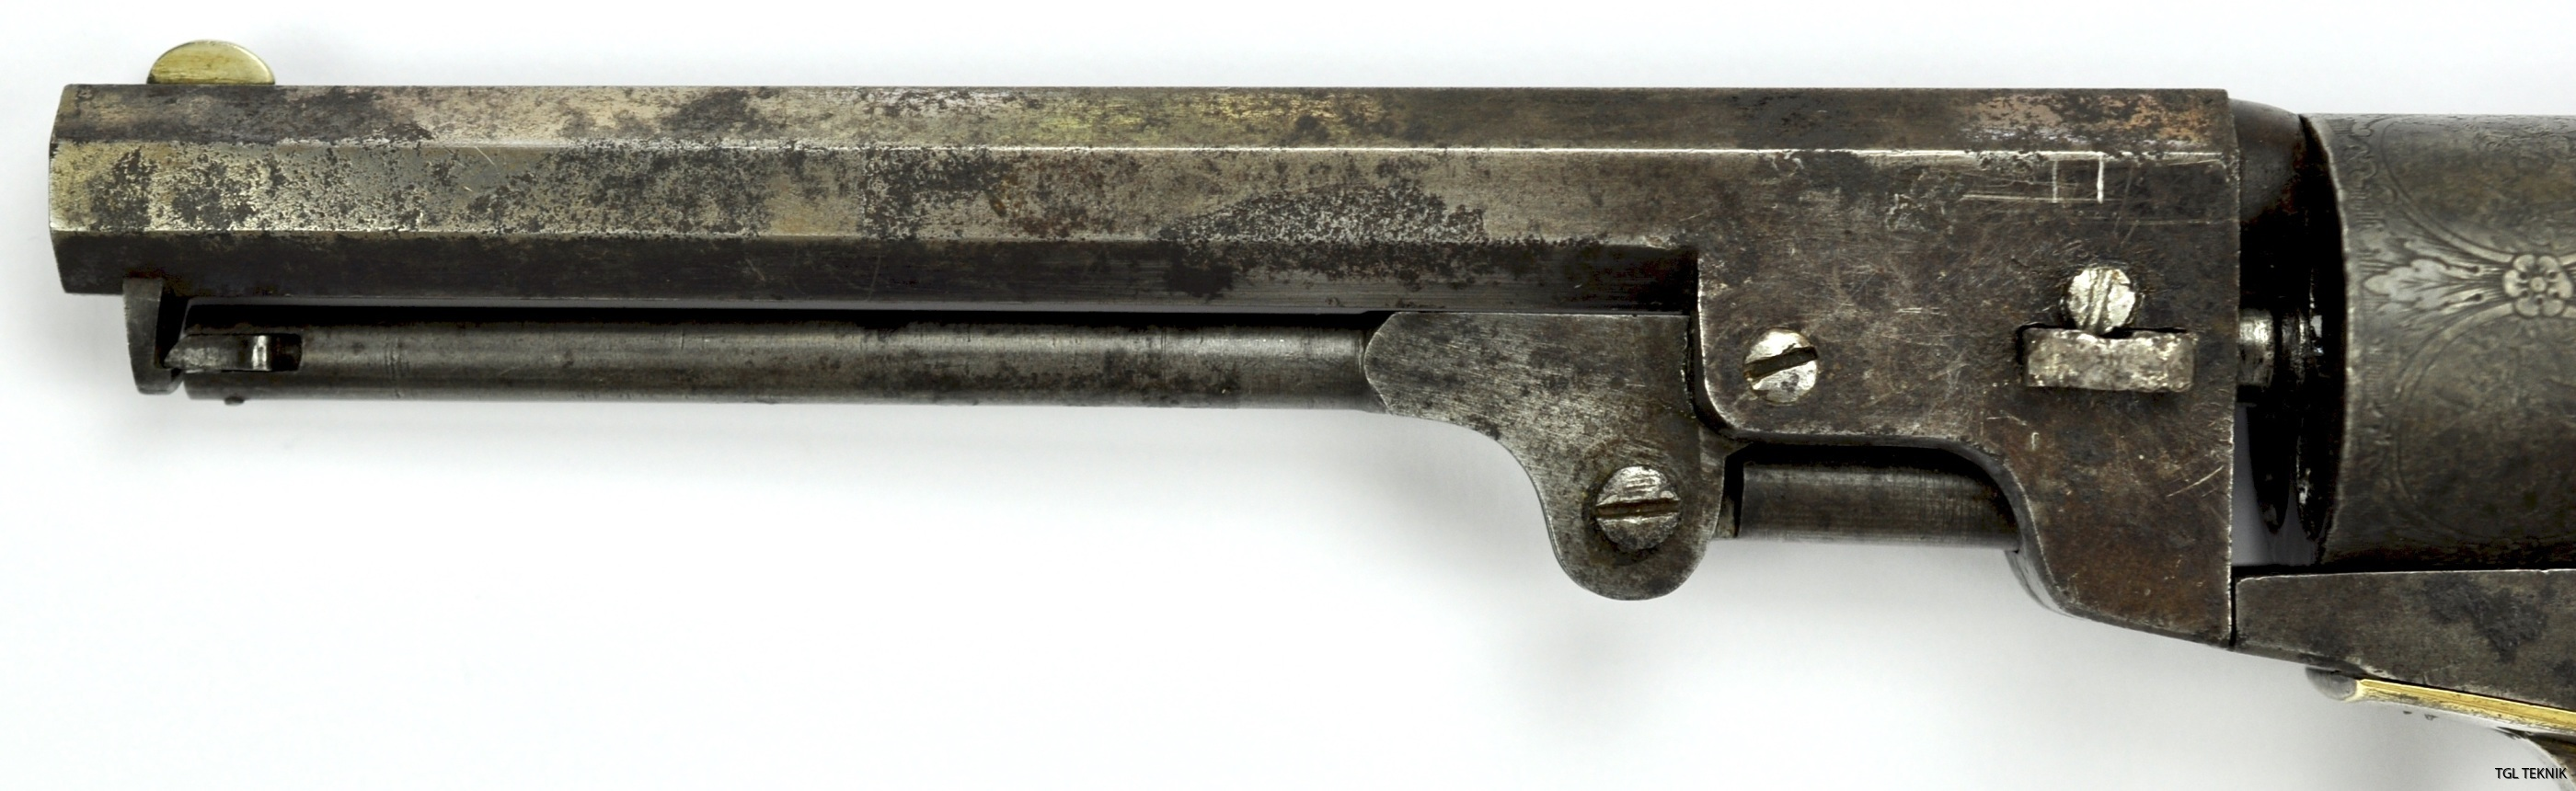 fullsizeoutput_1933